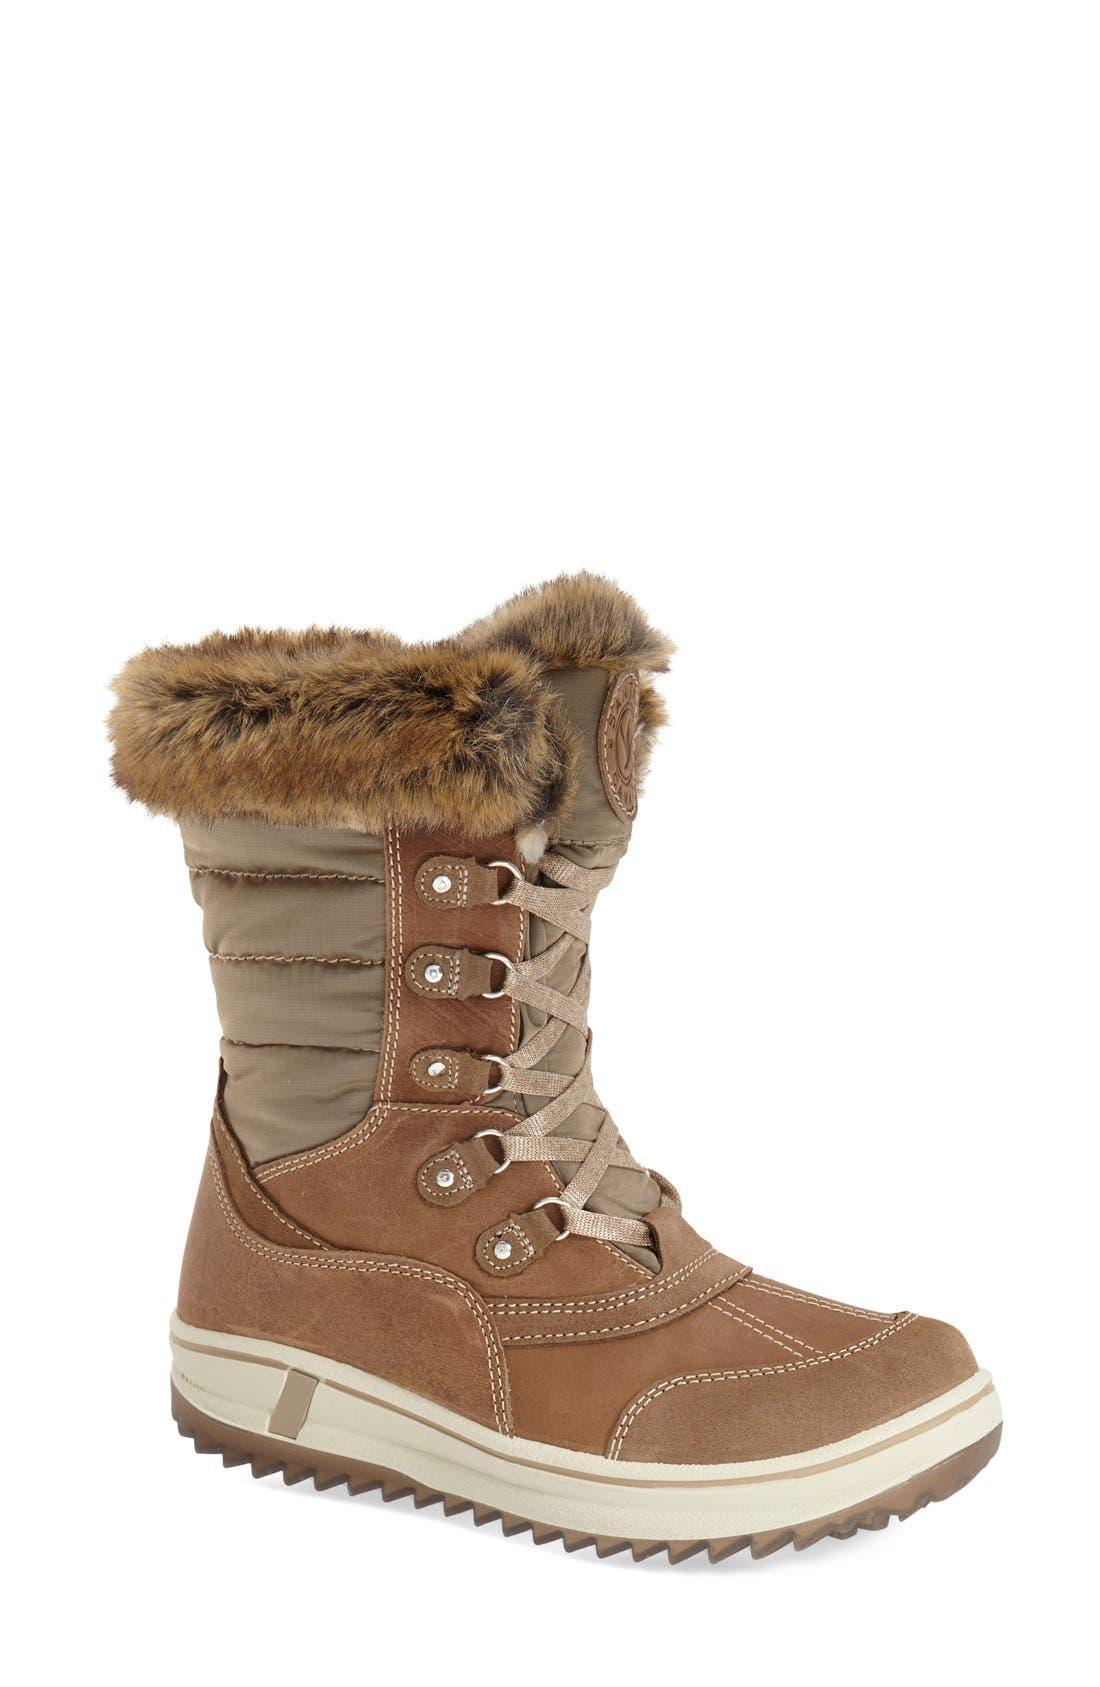 Alternate Image 1 Selected - Santana Canada 'Myrah' Faux Fur Waterproof Boot (Women)